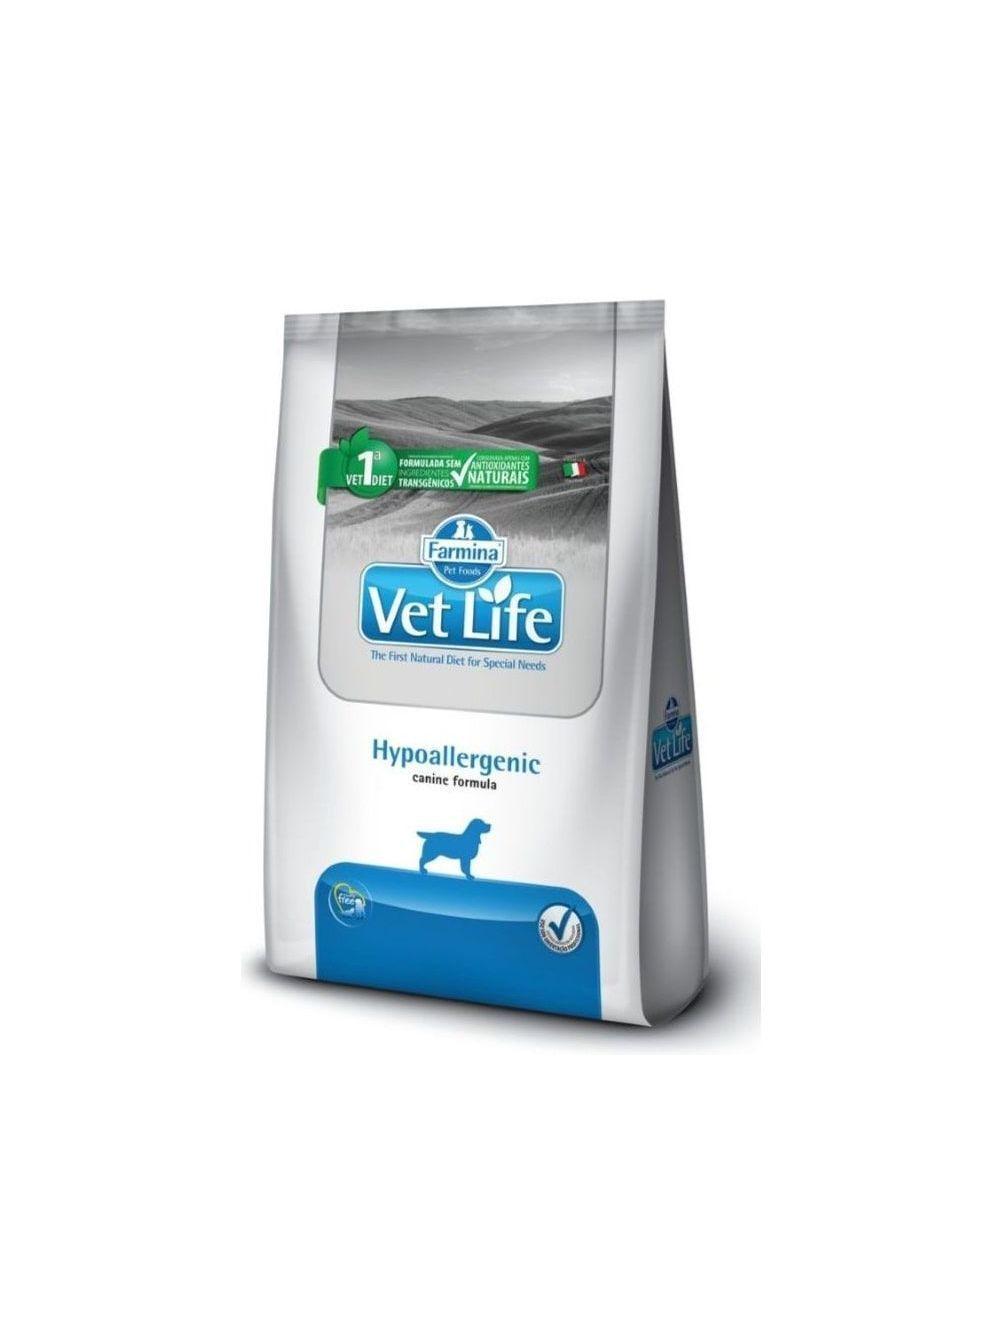 Comida Vet Life Hypoallergenic 2 Kg - ciudaddemascotas.com